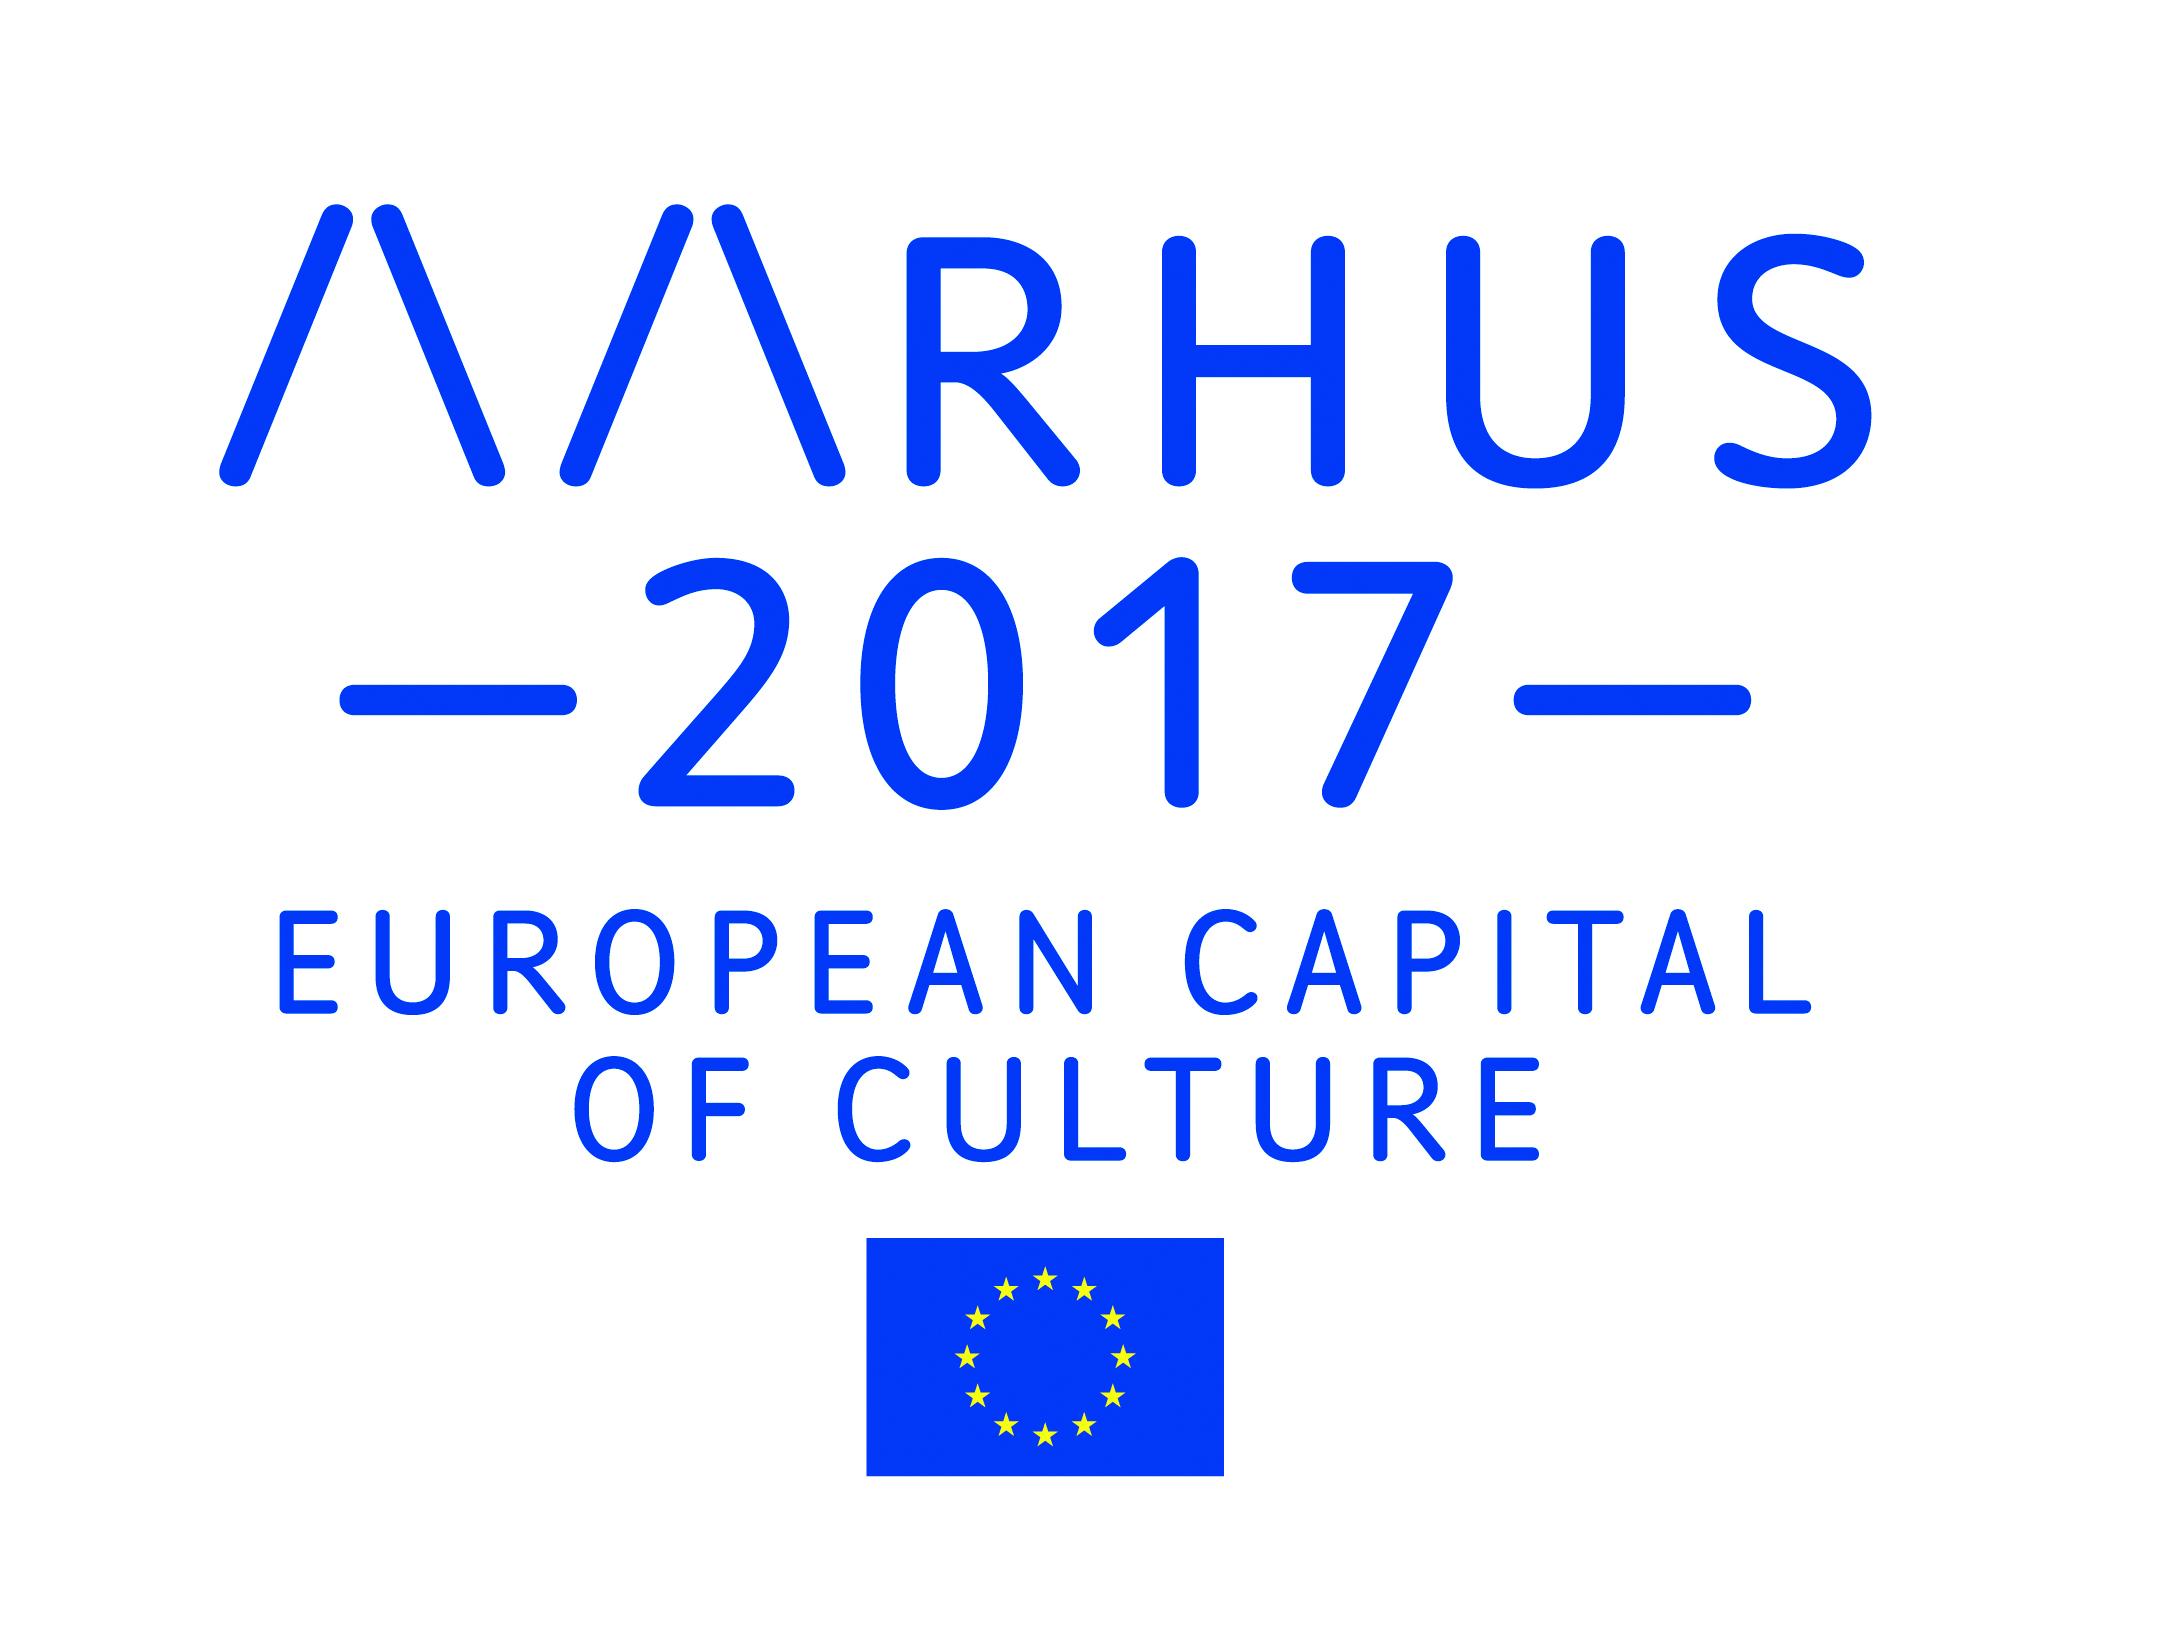 European Capital of Culture, Aarhus 2017